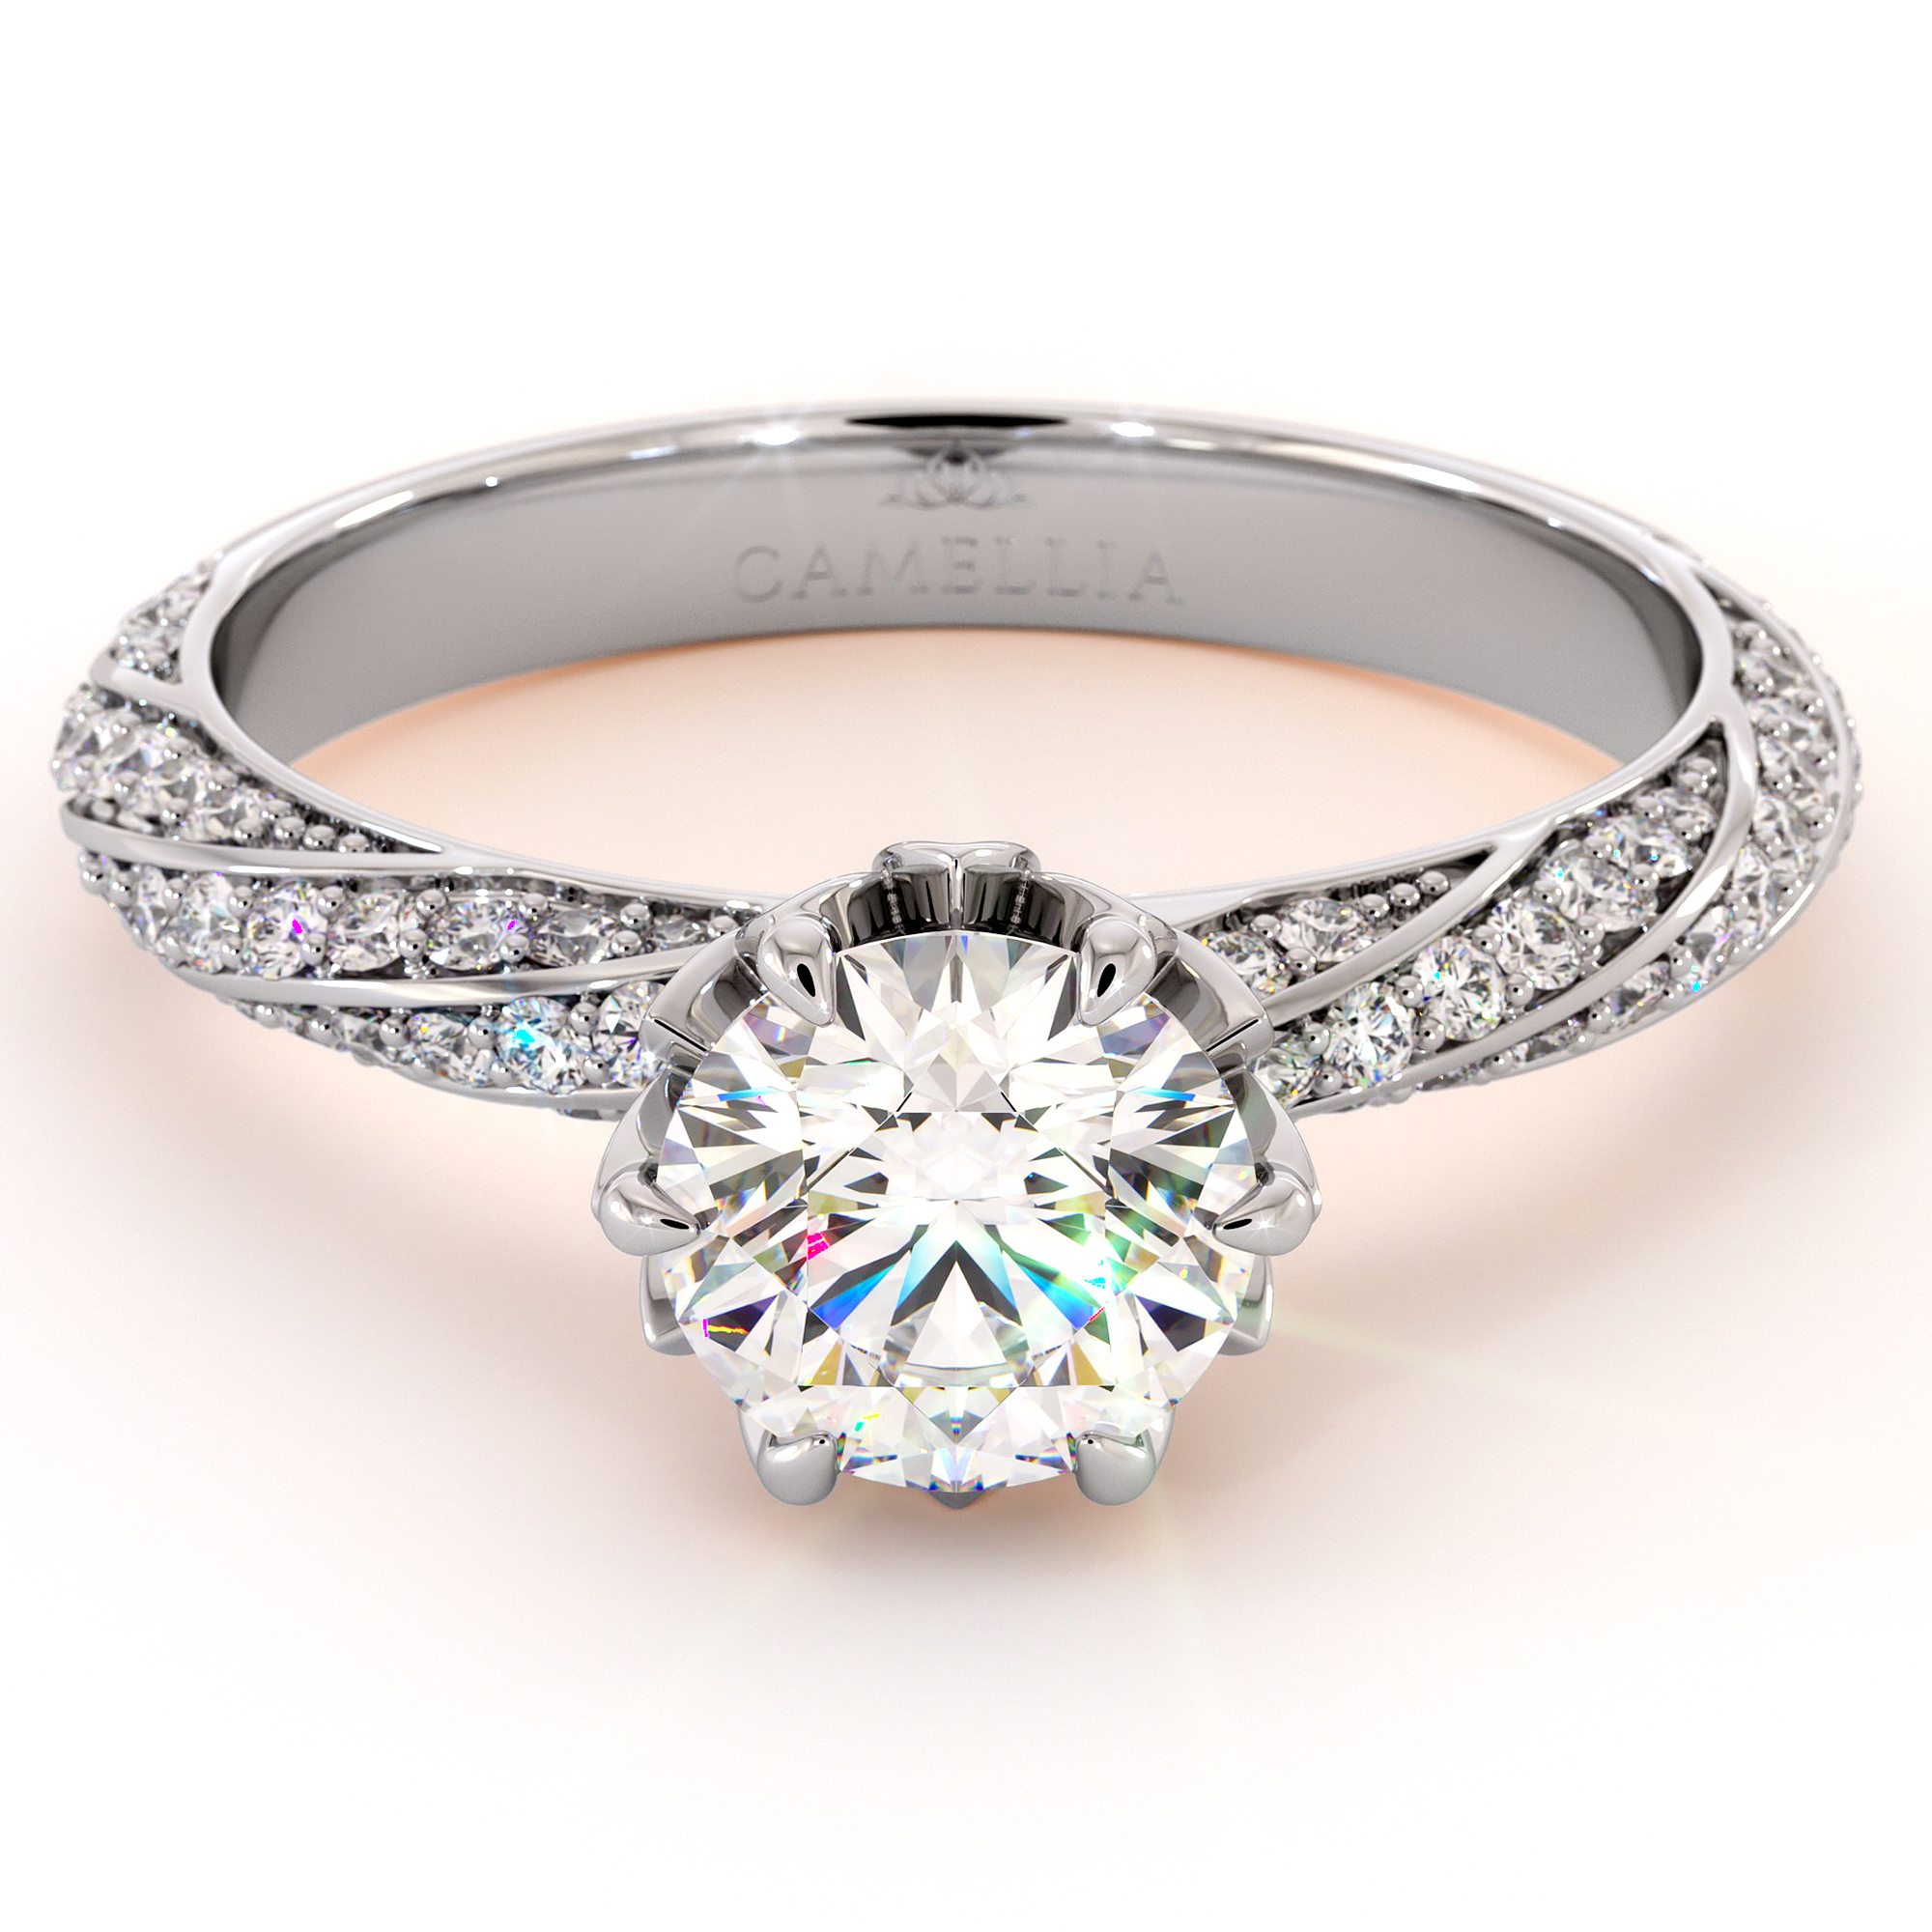 Diamonds Floral Crown Classic Engagement Ring Moissanite 1 Carat Proposal Ring